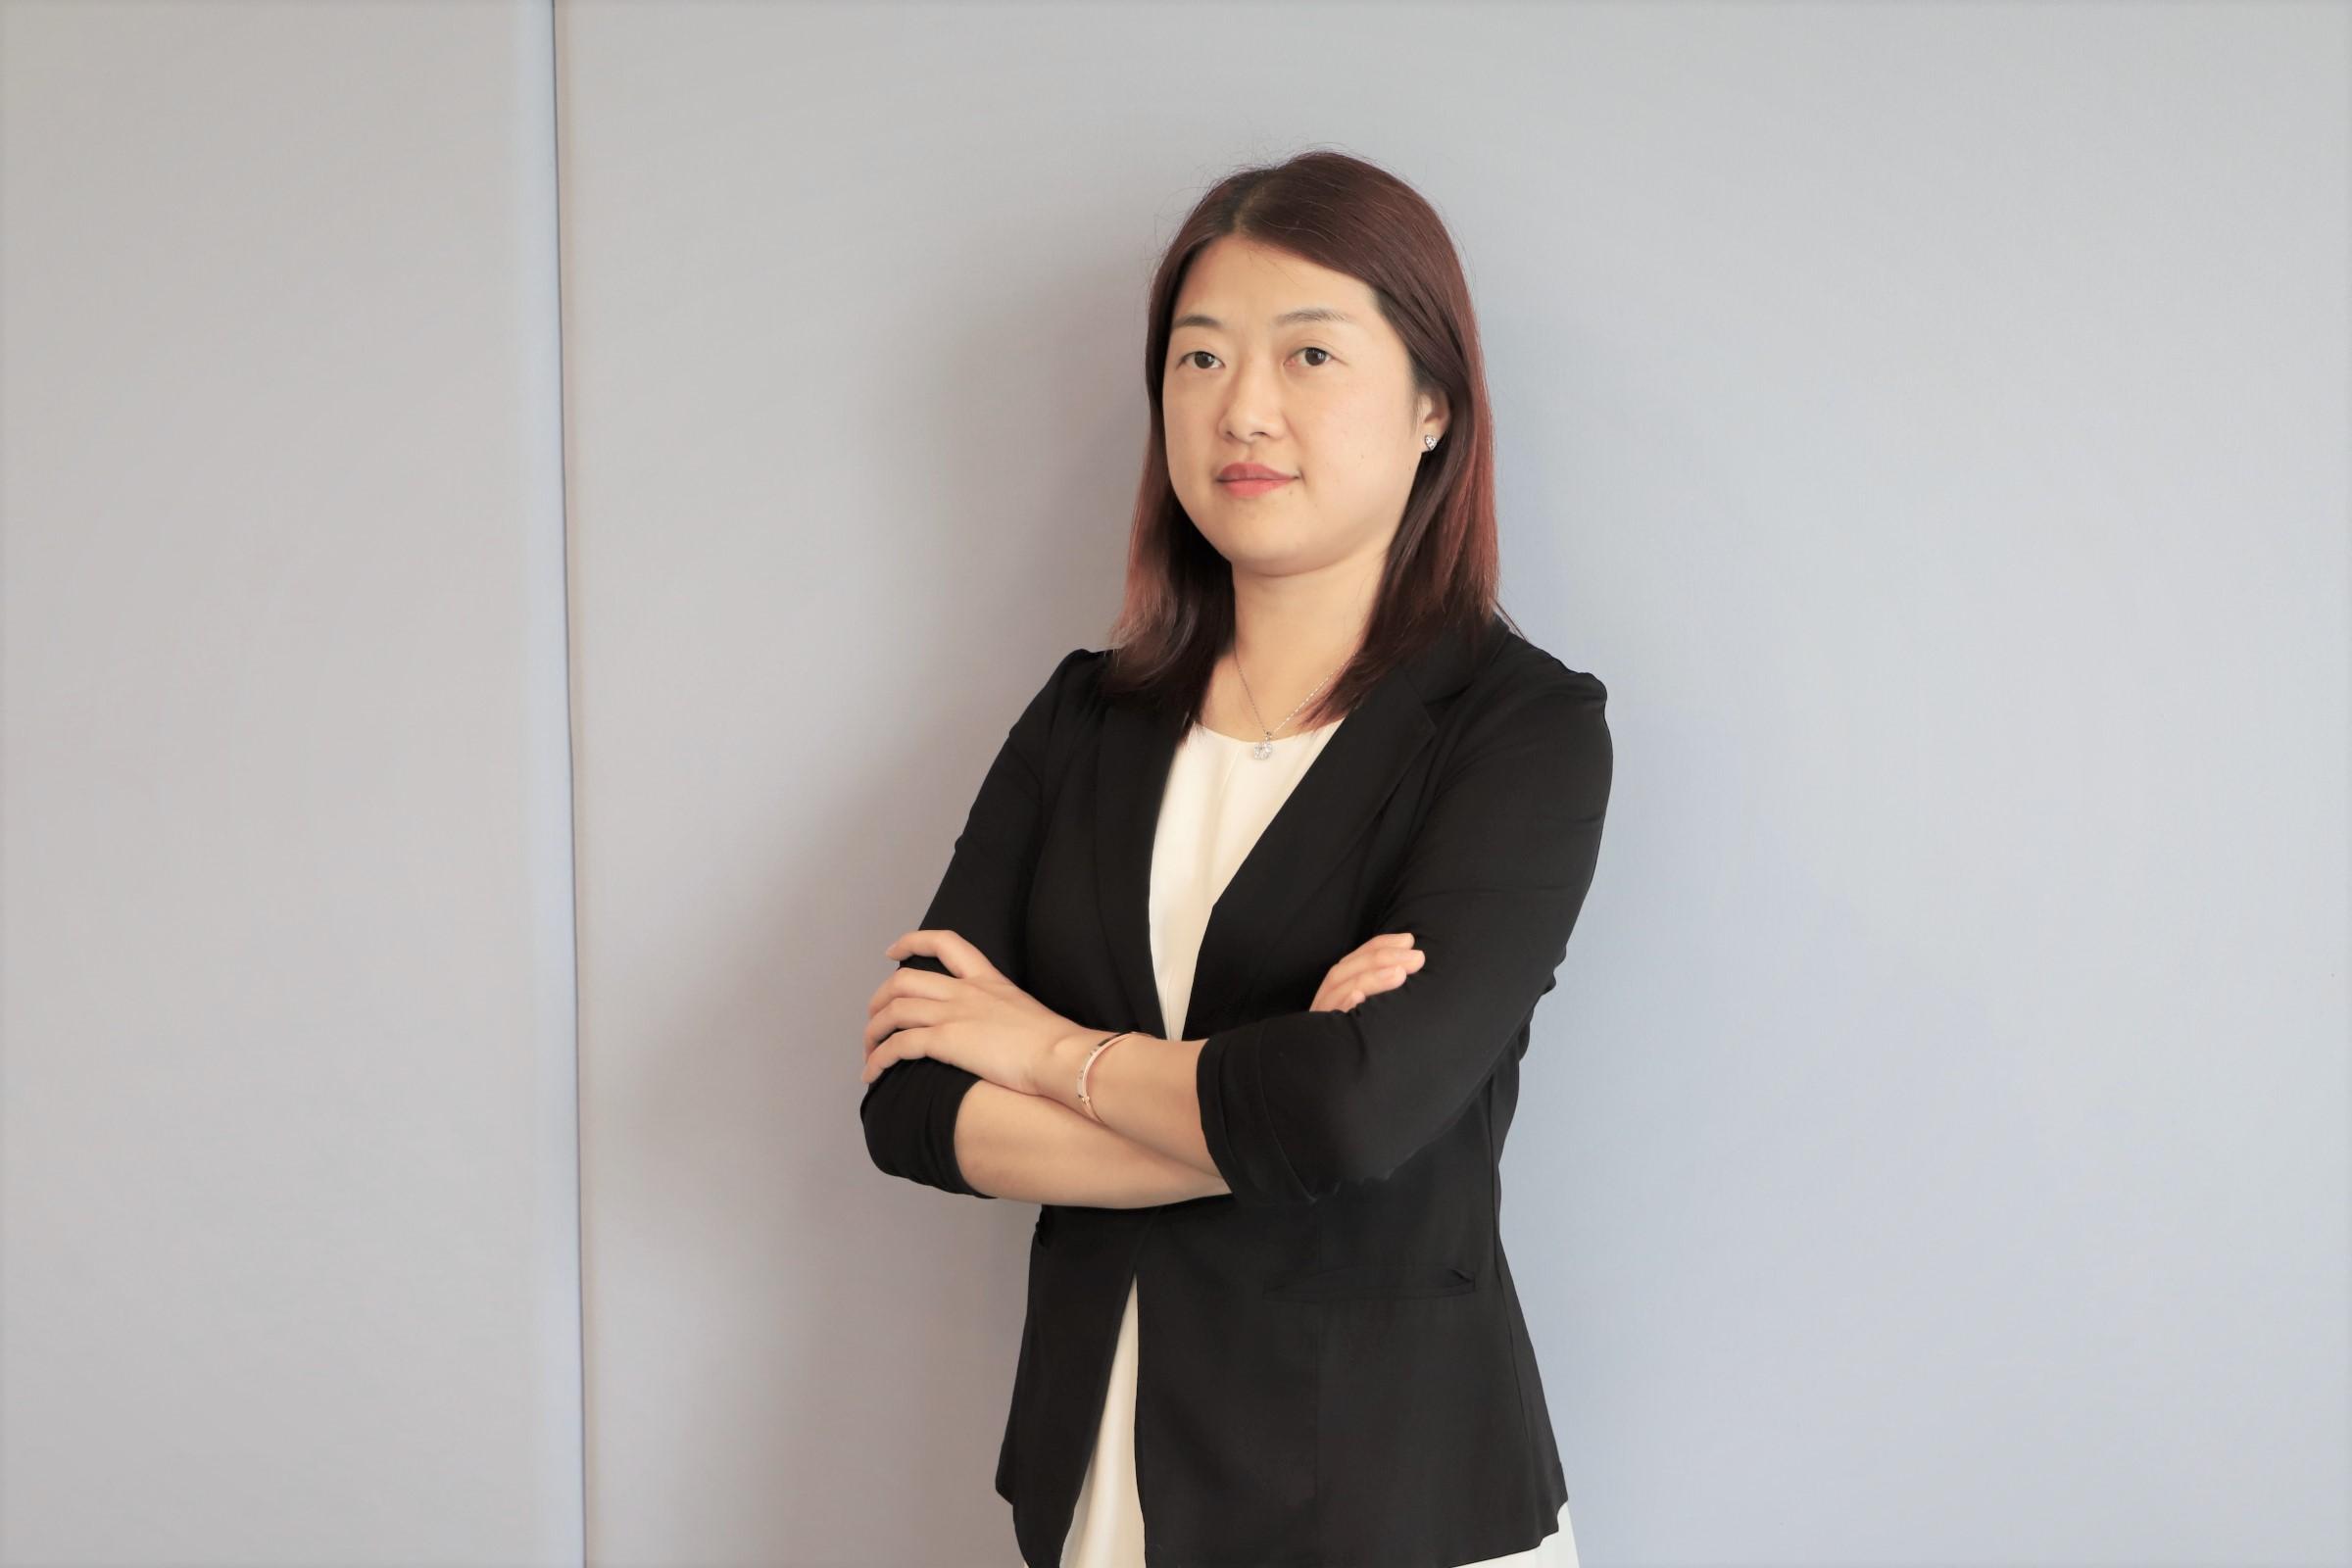 【MokaHR专访】拍拍贷HRVP Summer:做一个懂建模的HR-Moka智能化招聘系统